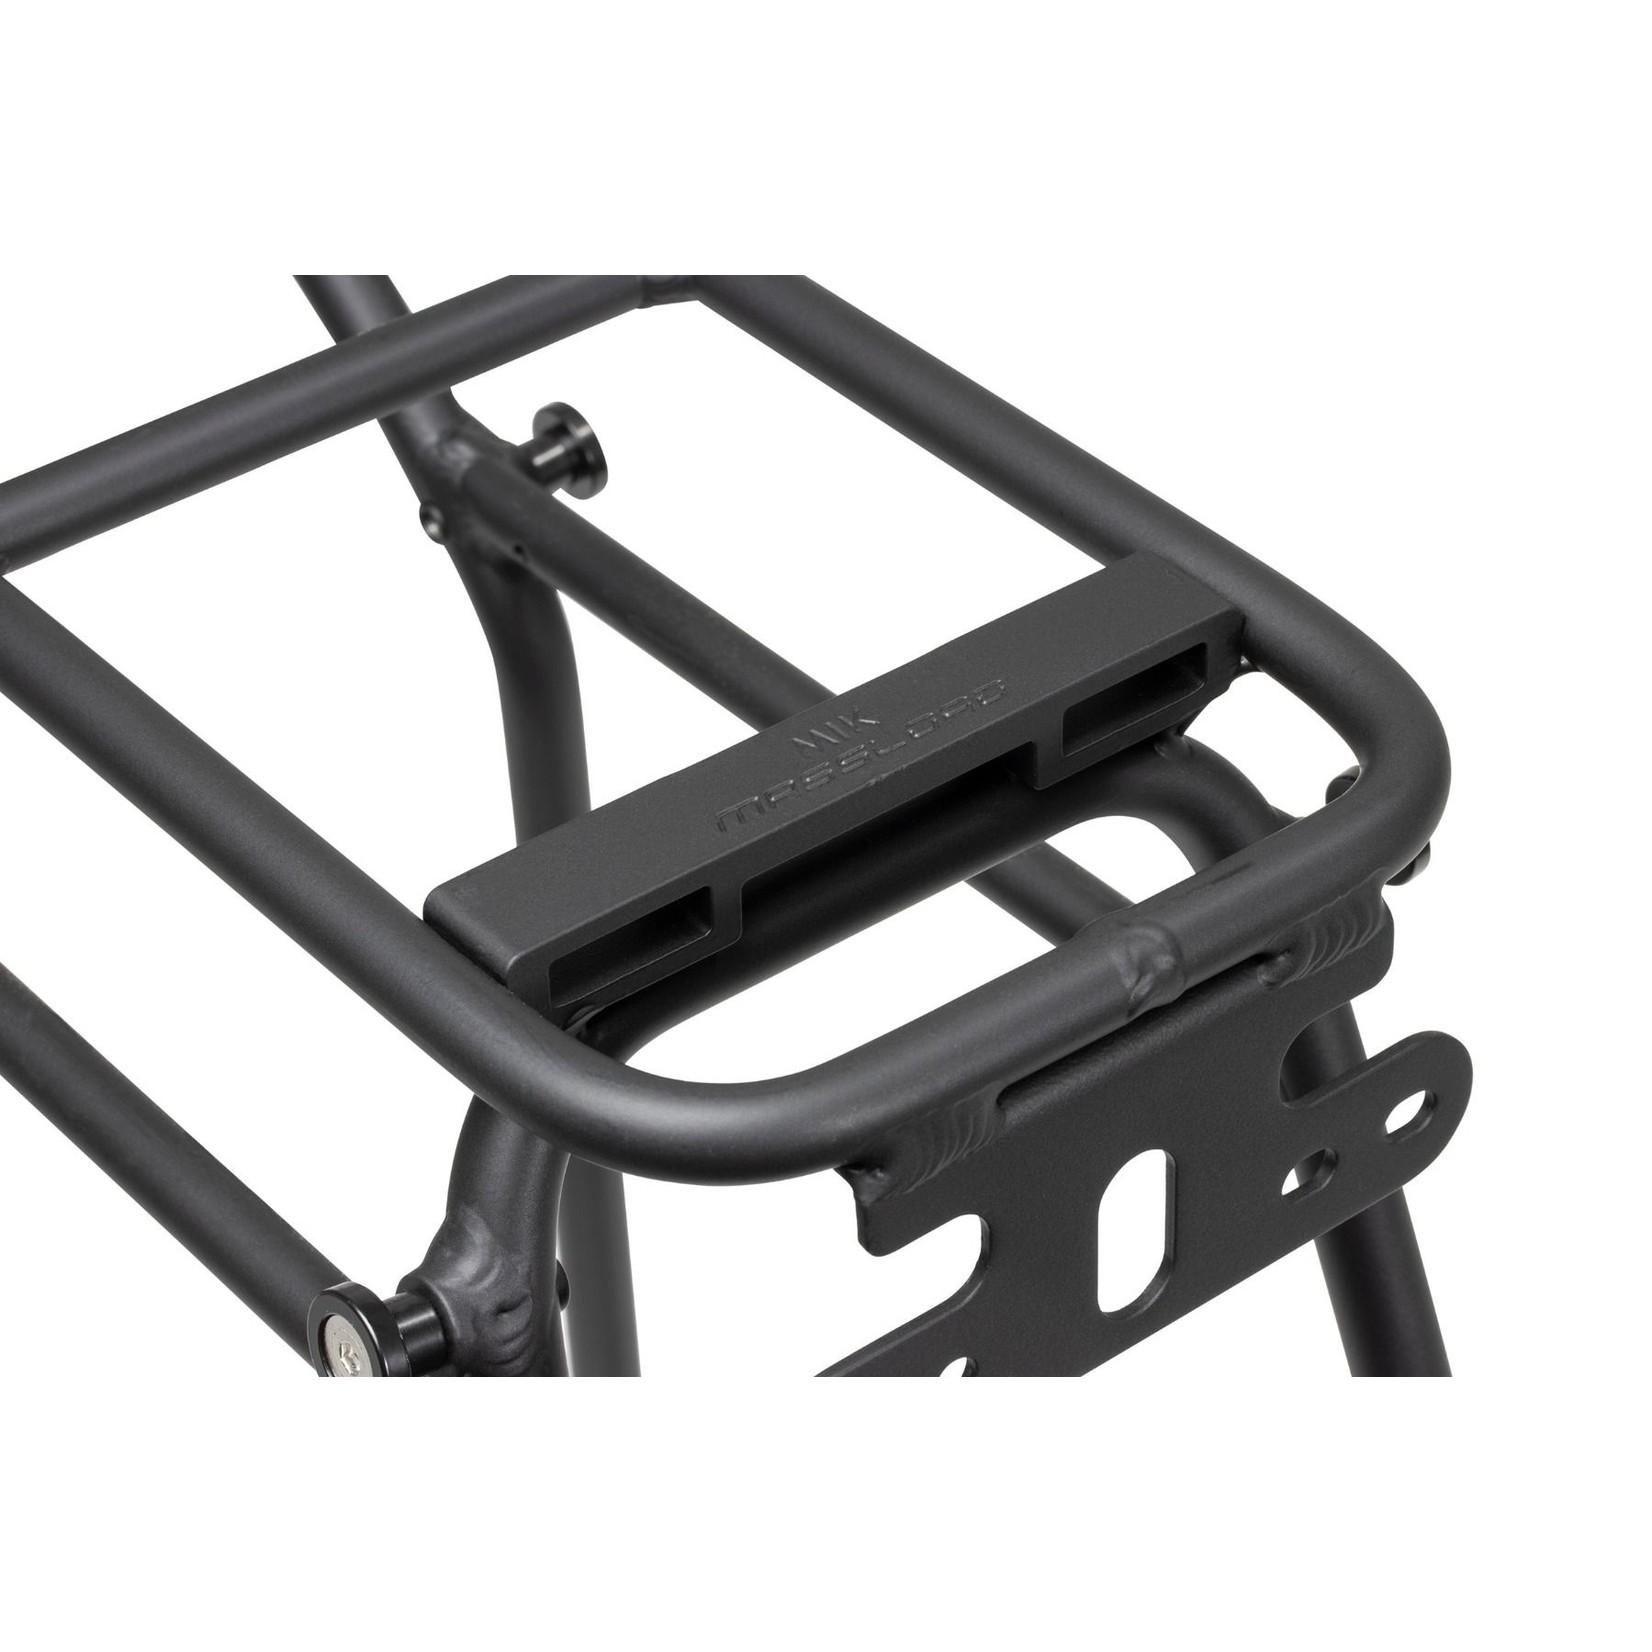 Ortlieb Rack R3 Aluminium QL3/QL3.1 - black 26/28inch